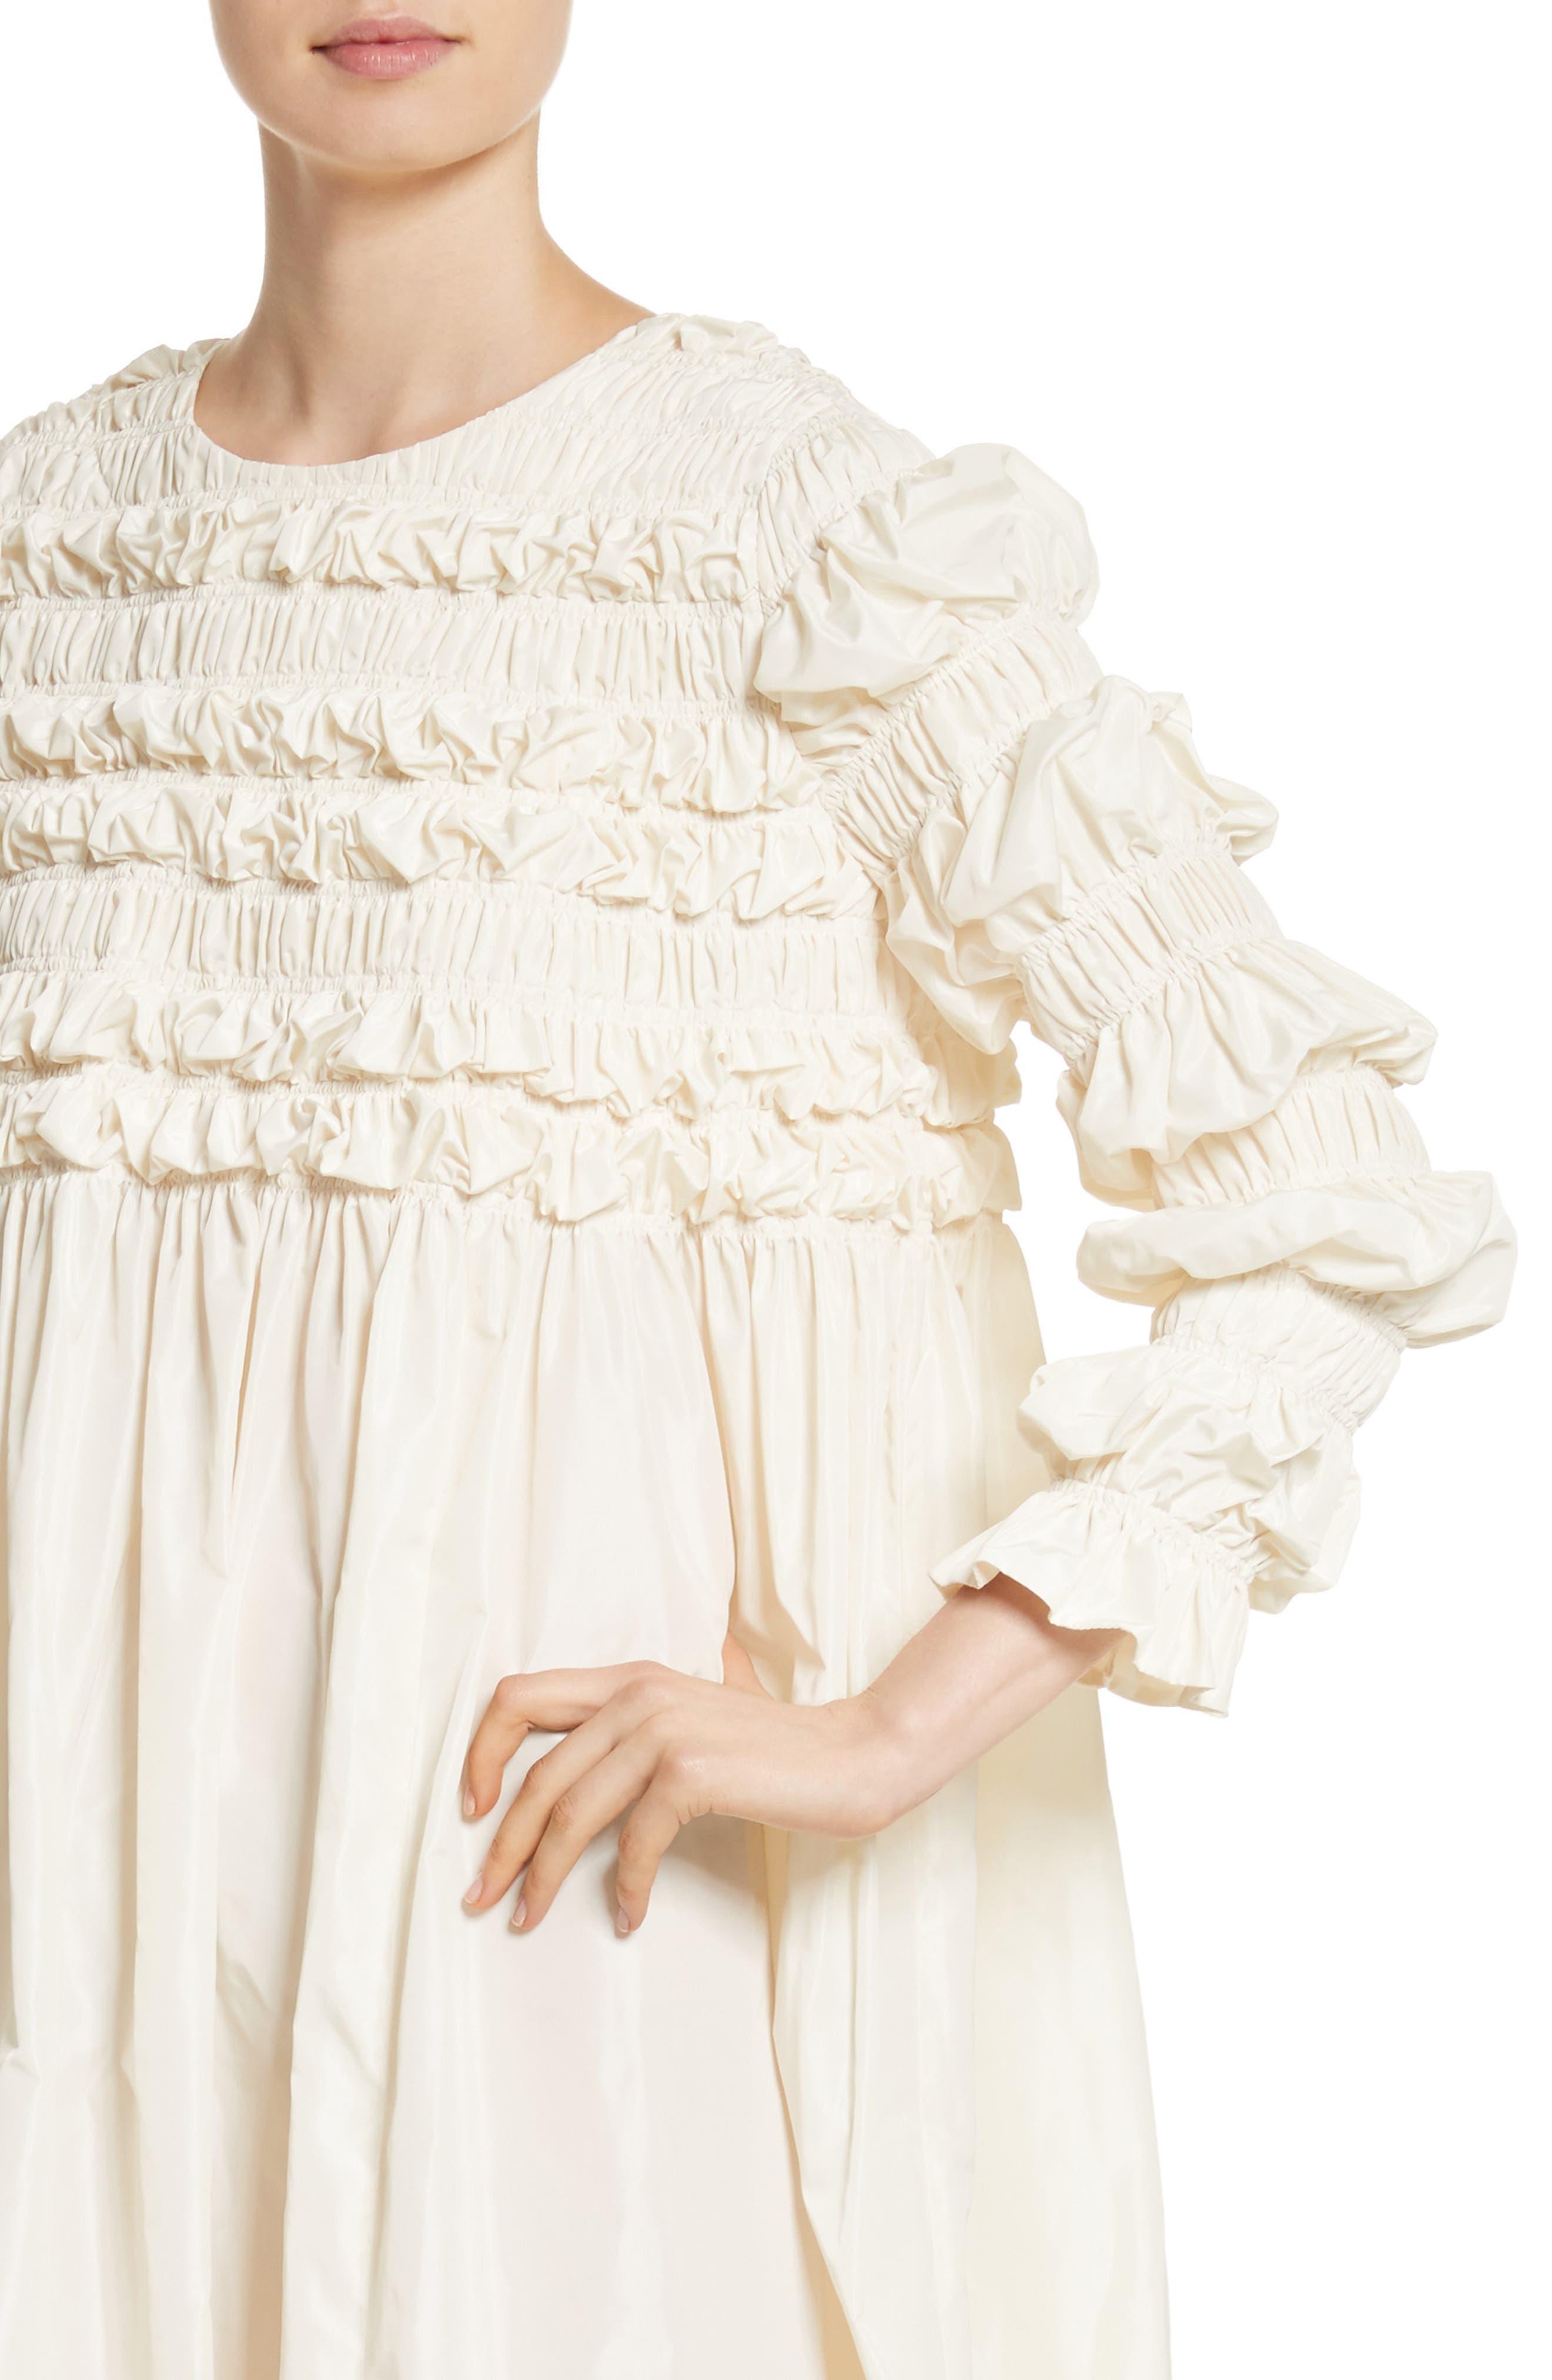 Lizzie Ruffled Taffeta Dress,                             Alternate thumbnail 4, color,                             900